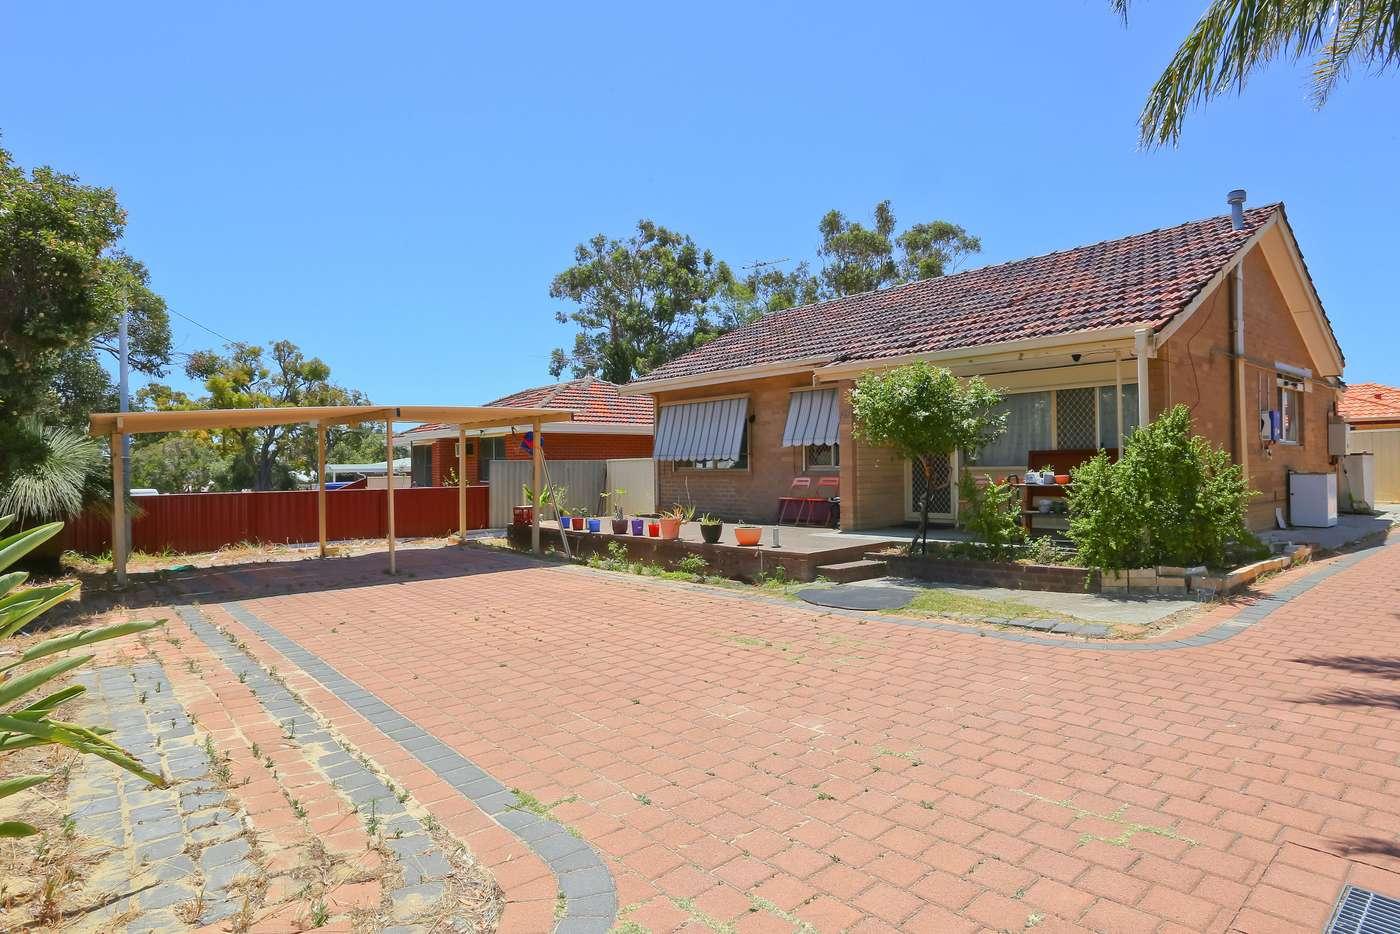 Main view of Homely house listing, 107 Balga Avenue, Balga WA 6061